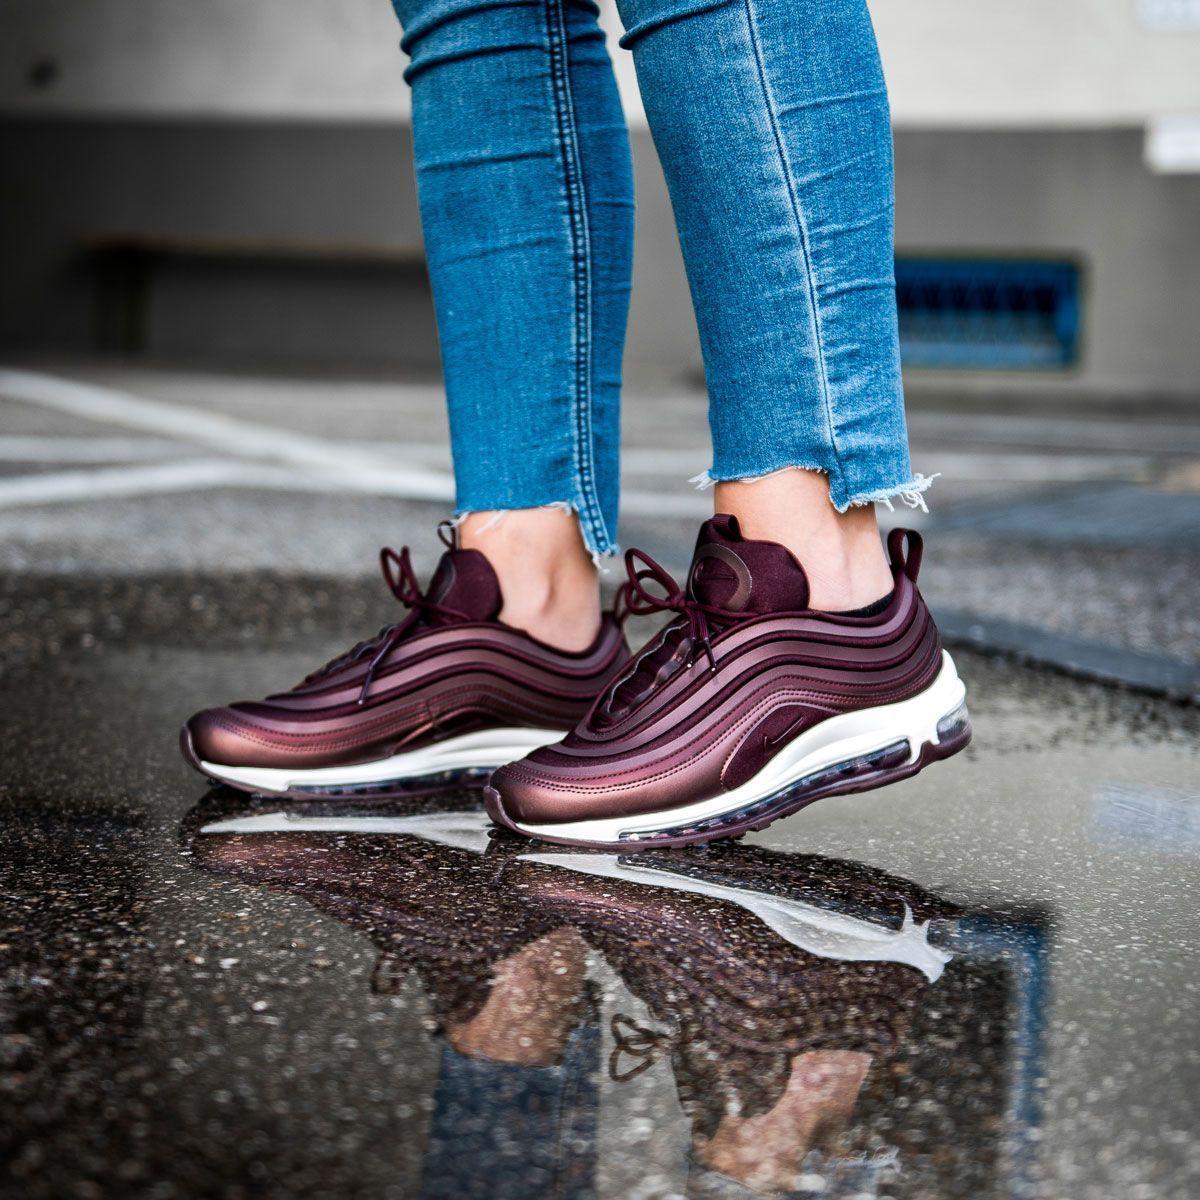 Buy Cheap 2019 Nike Air Max Thea Ultra Sneakers Pink Women